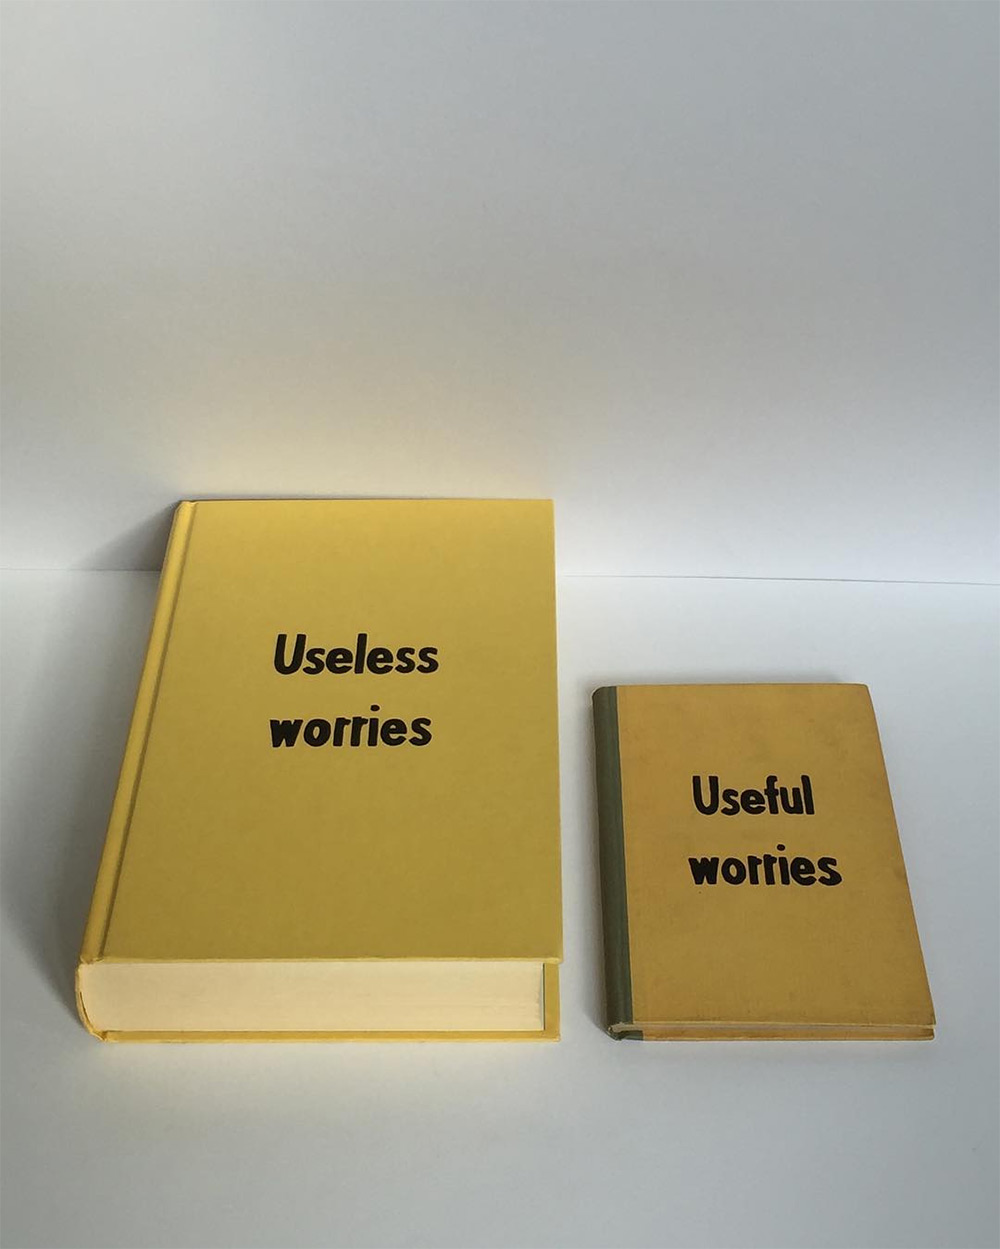 Gli ironici self-help book di Johan Deckmann | Collater.al 9